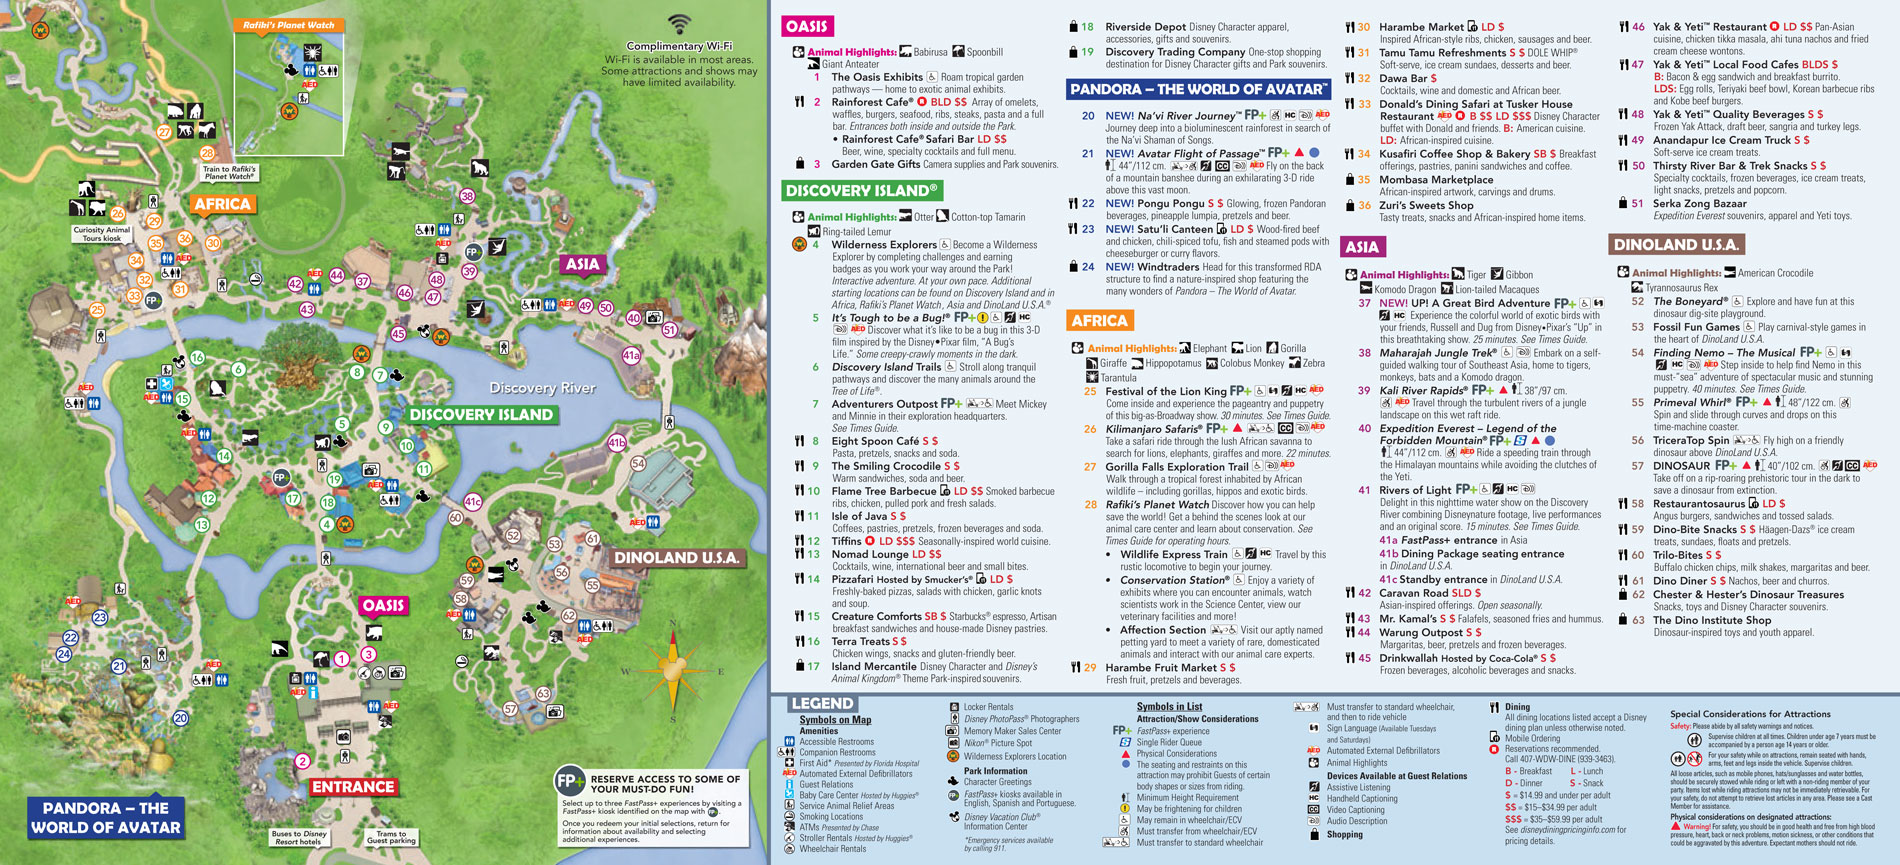 Animal Kingdom Discount Tickets | Visit Orlando